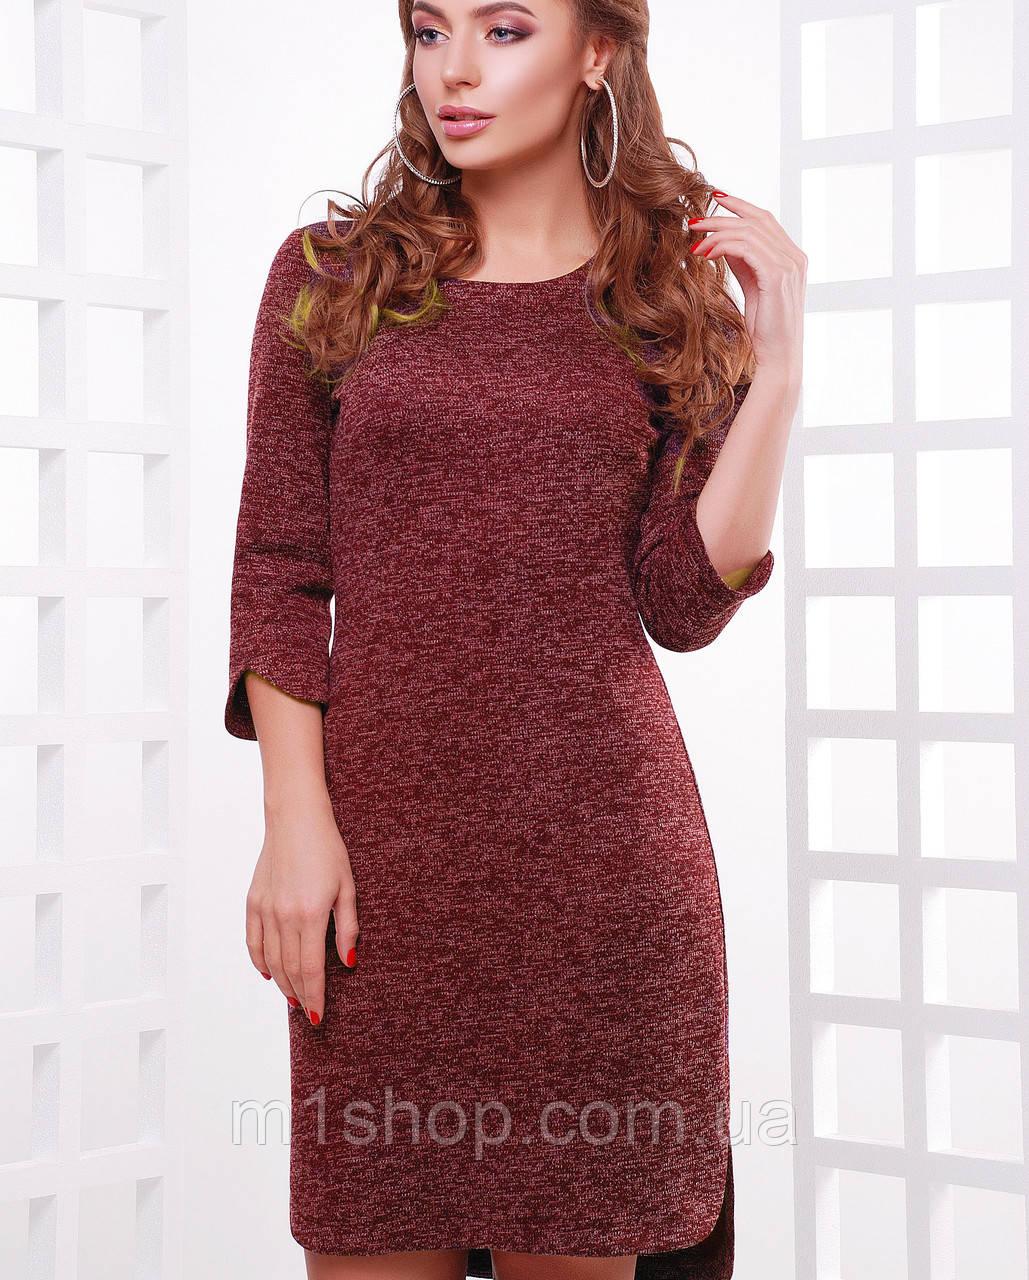 Ангоровое асимметричное платье (1760 mrs)